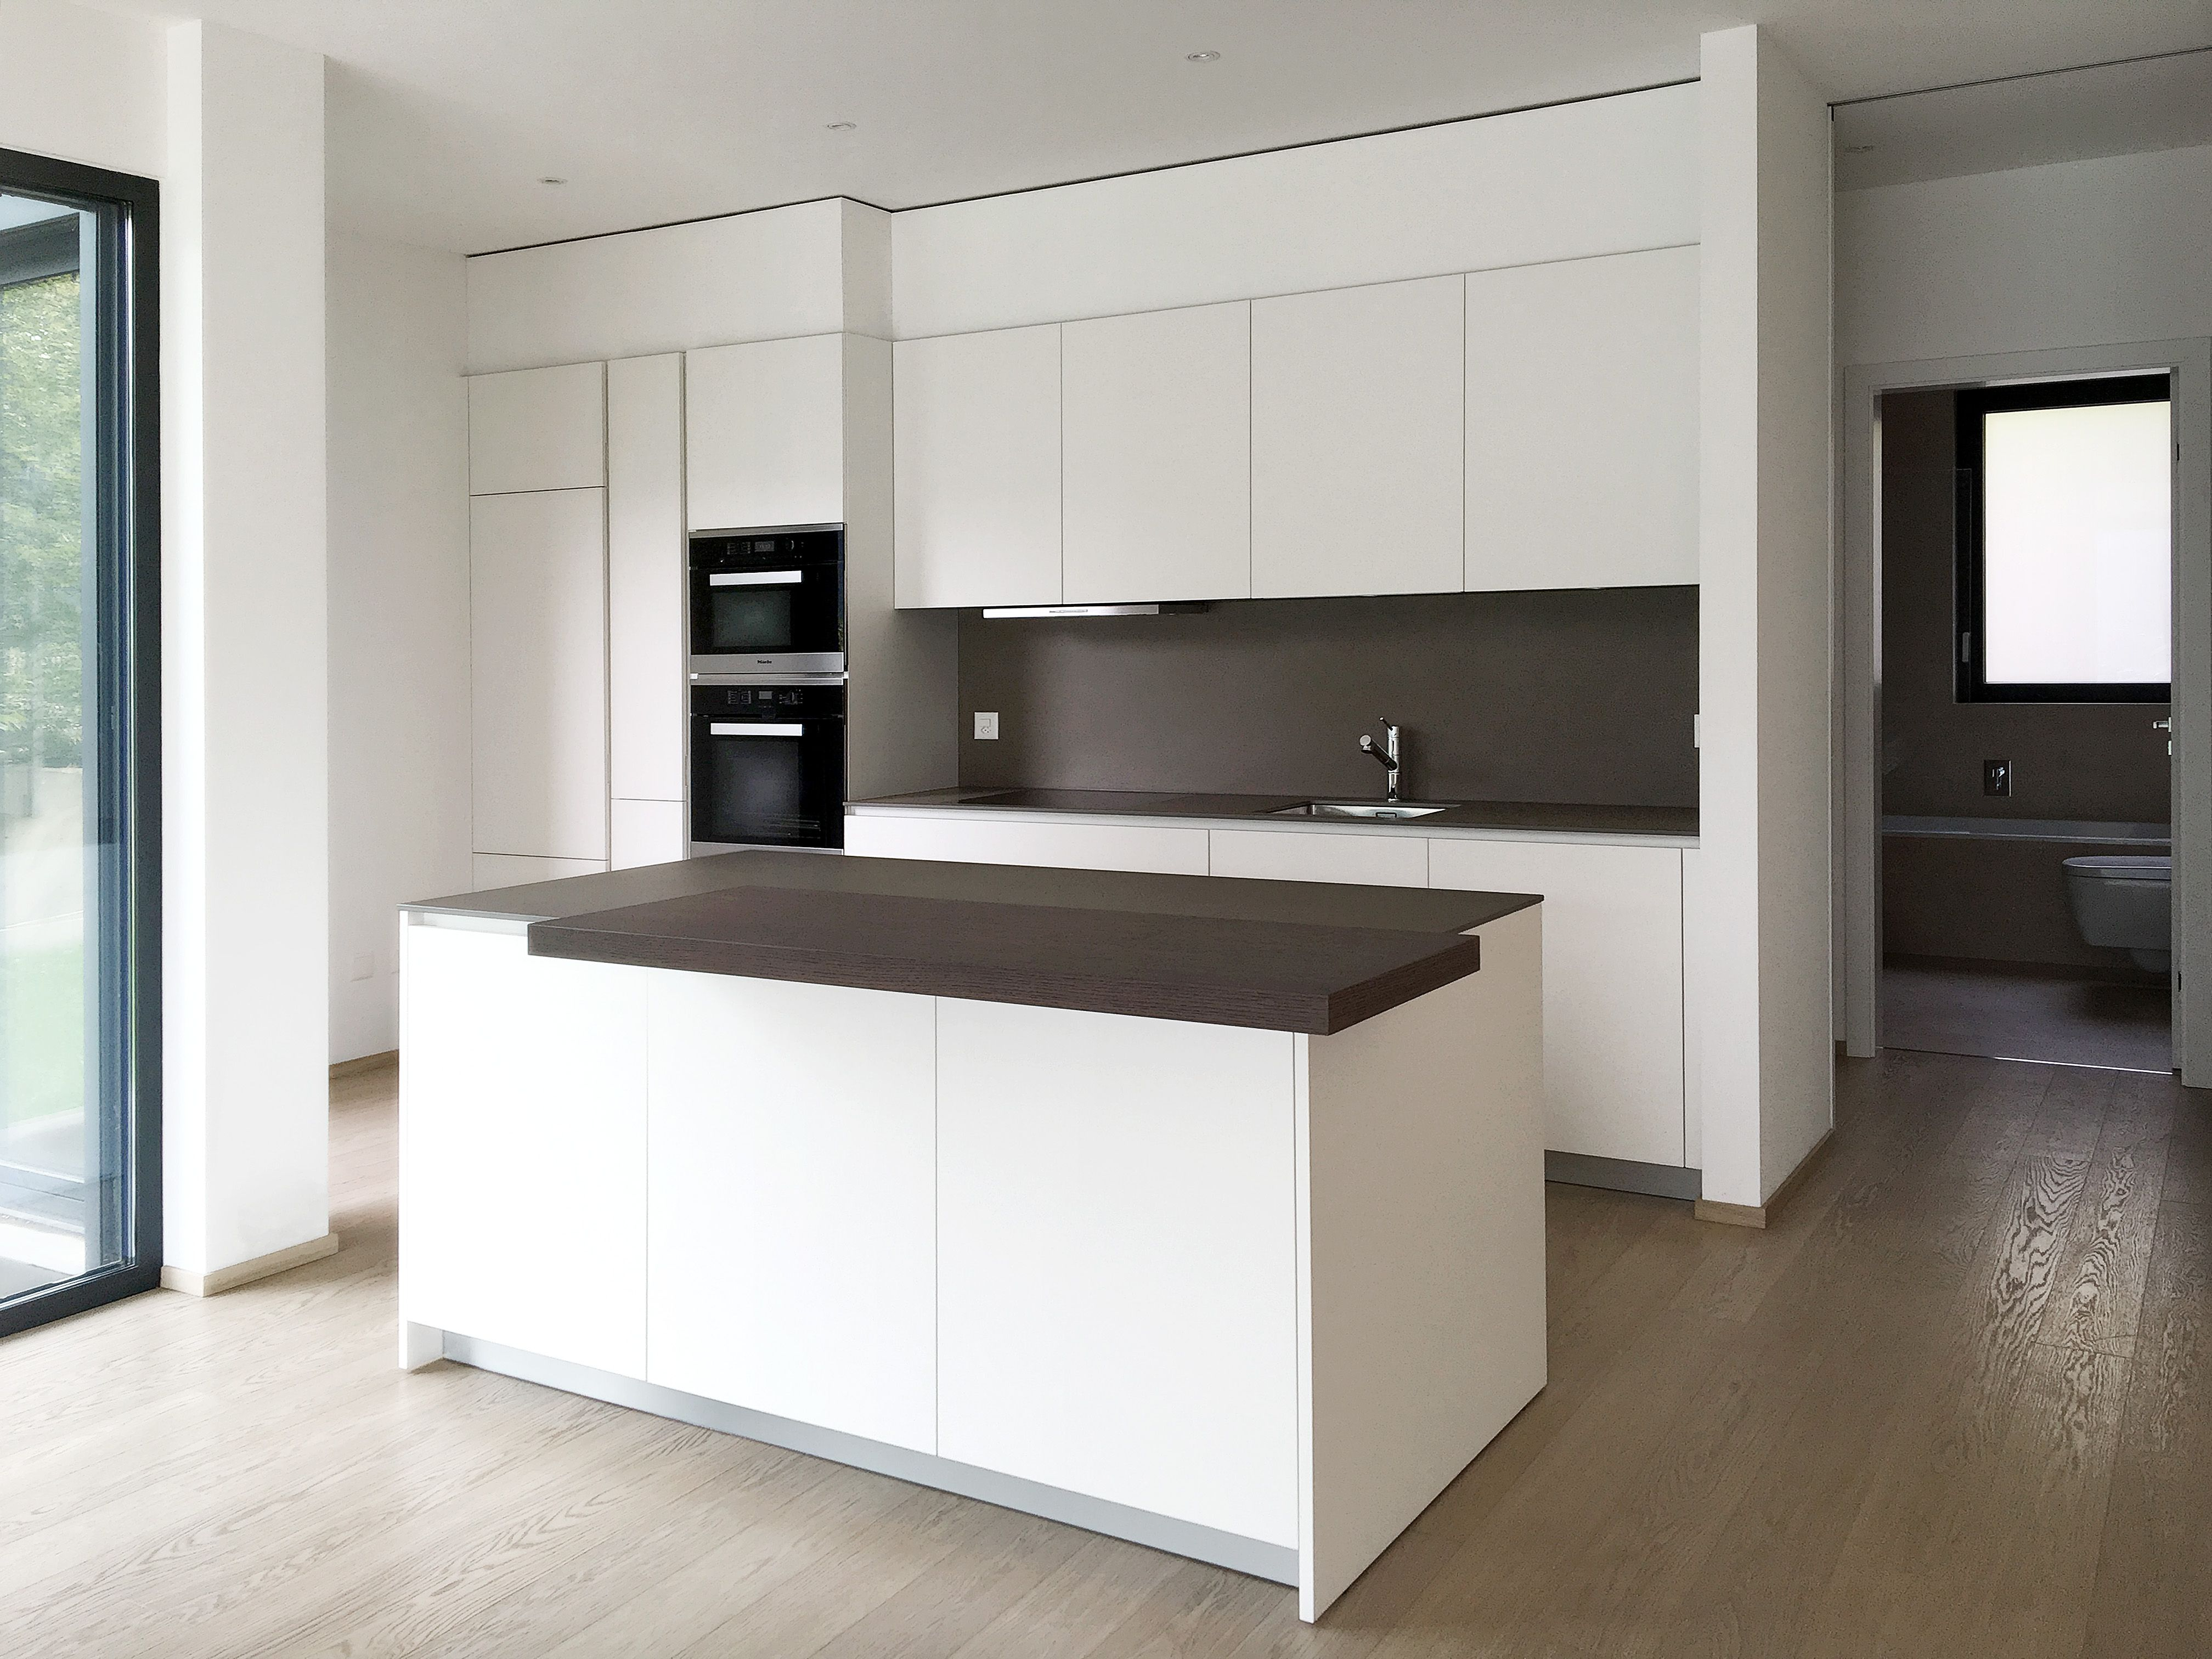 Cucina design varenna poliform laccata bianca con piano in ceramica cucine varenna canton - Isole cucine moderne ...